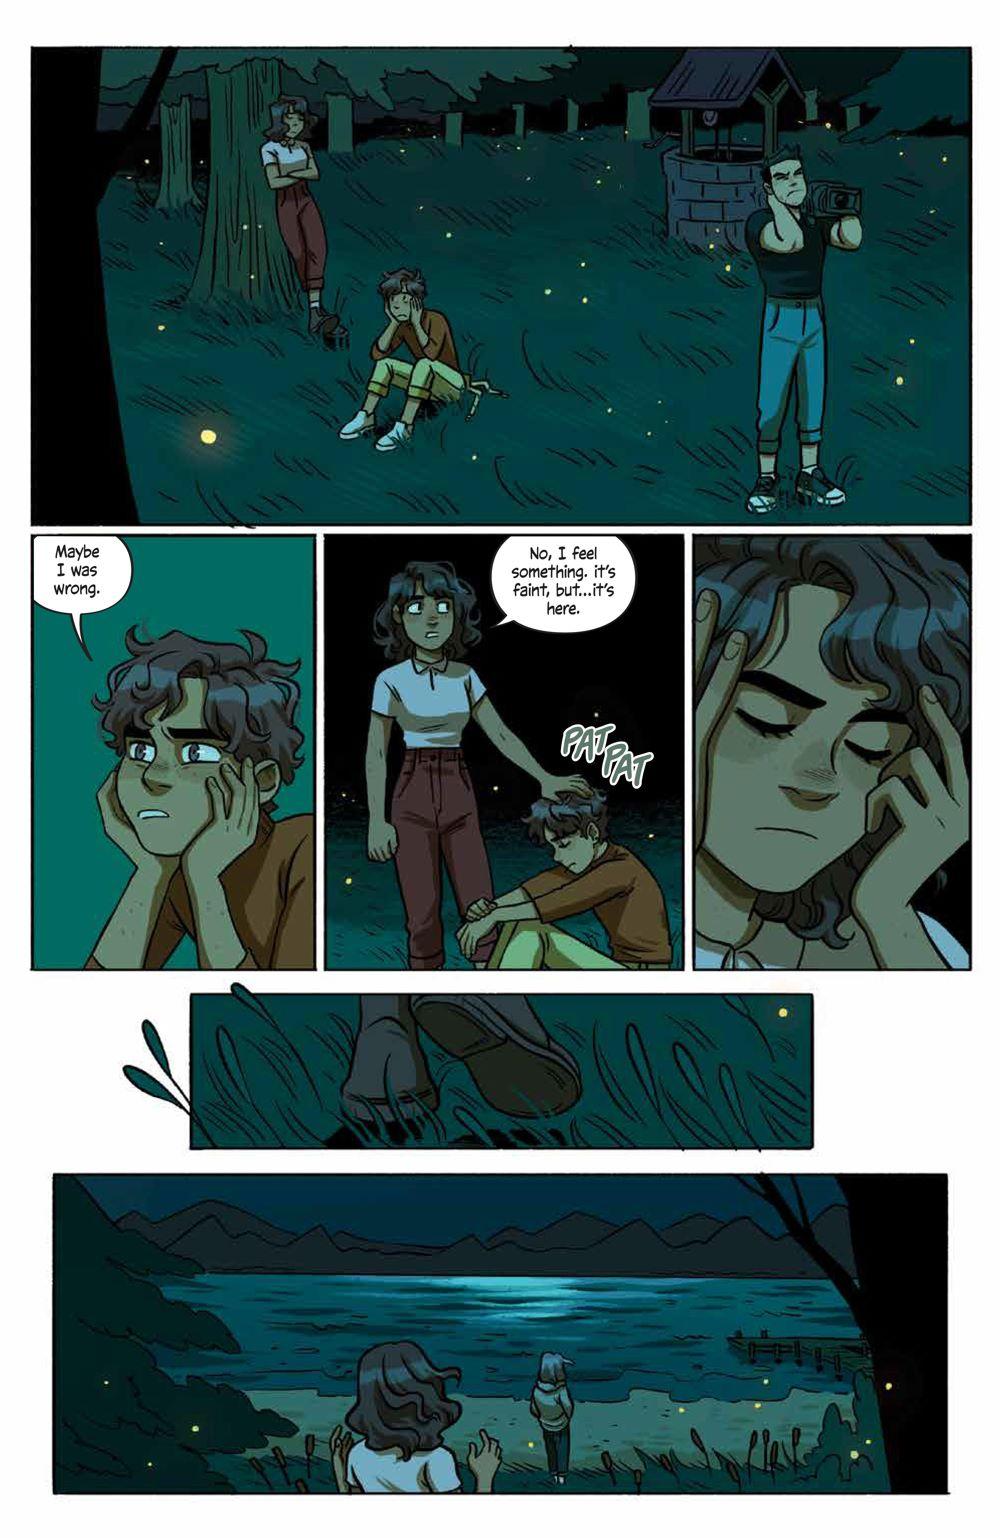 SpecterInspectors_004_PRESS_7 ComicList Previews: SPECTER INSPECTORS #4 (OF 5)